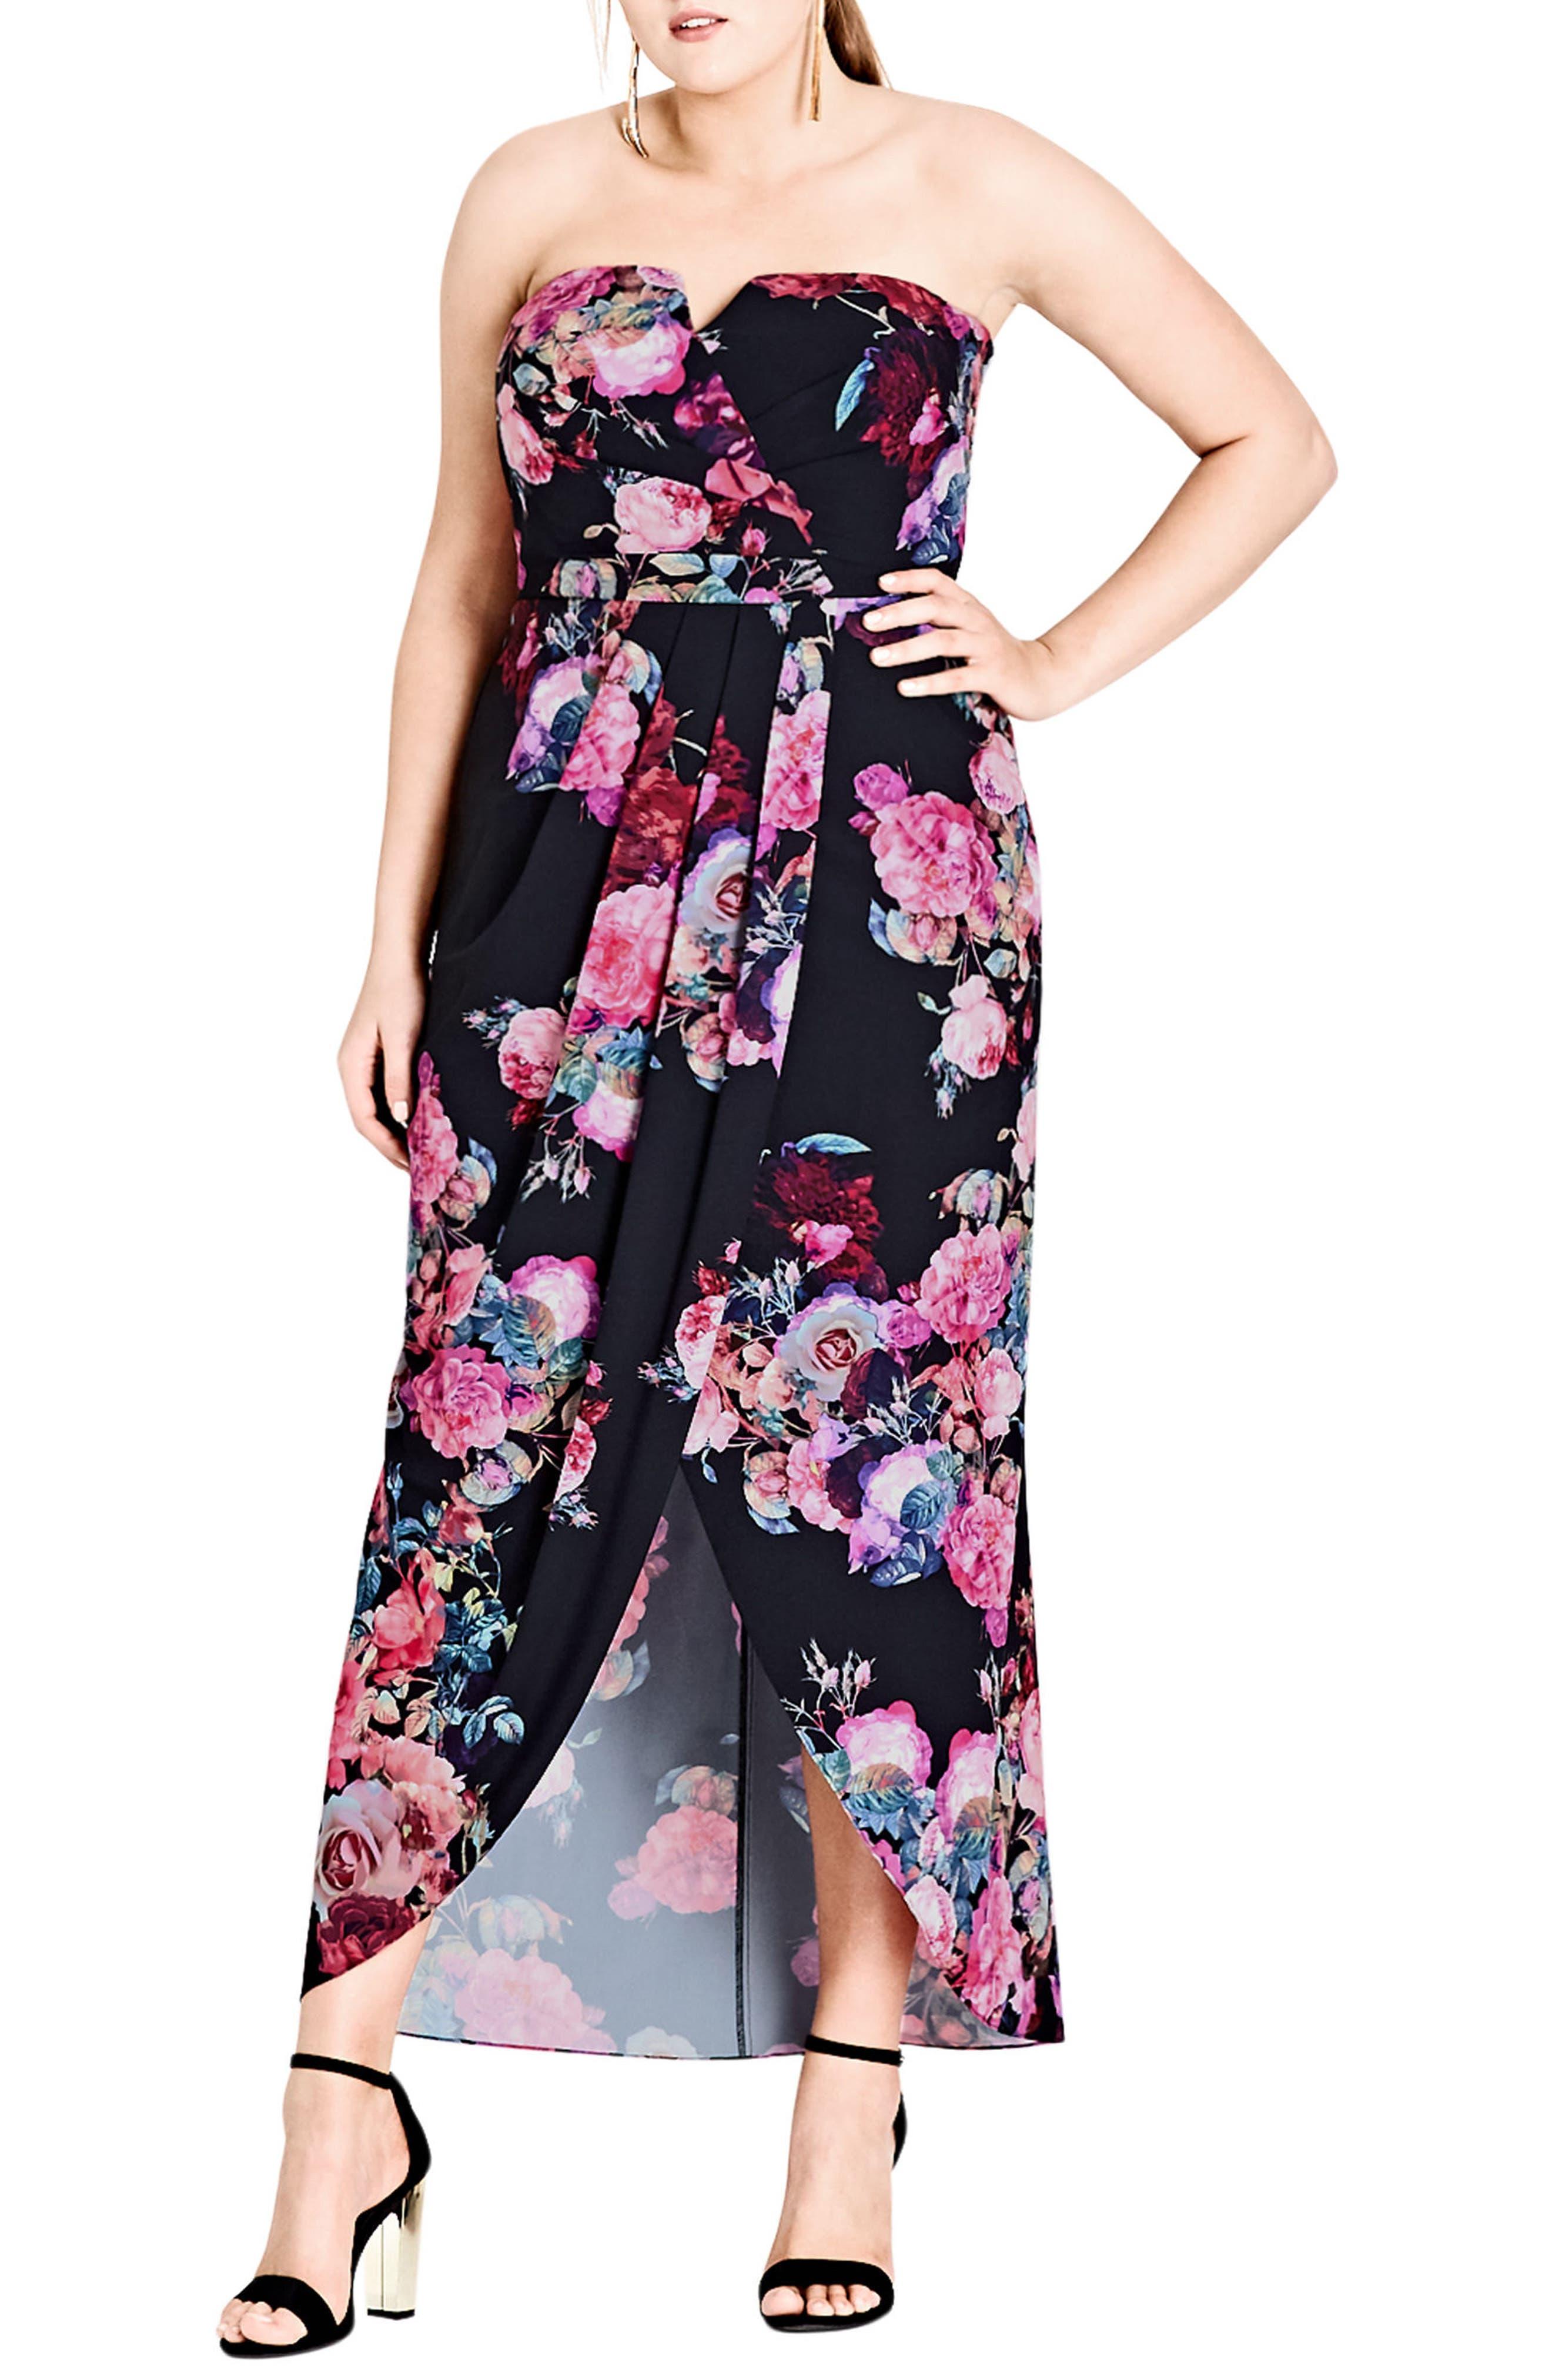 Alternate Image 1 Selected - City Chic Romantic Rose Strapless Maxi Dress (Plus Size)